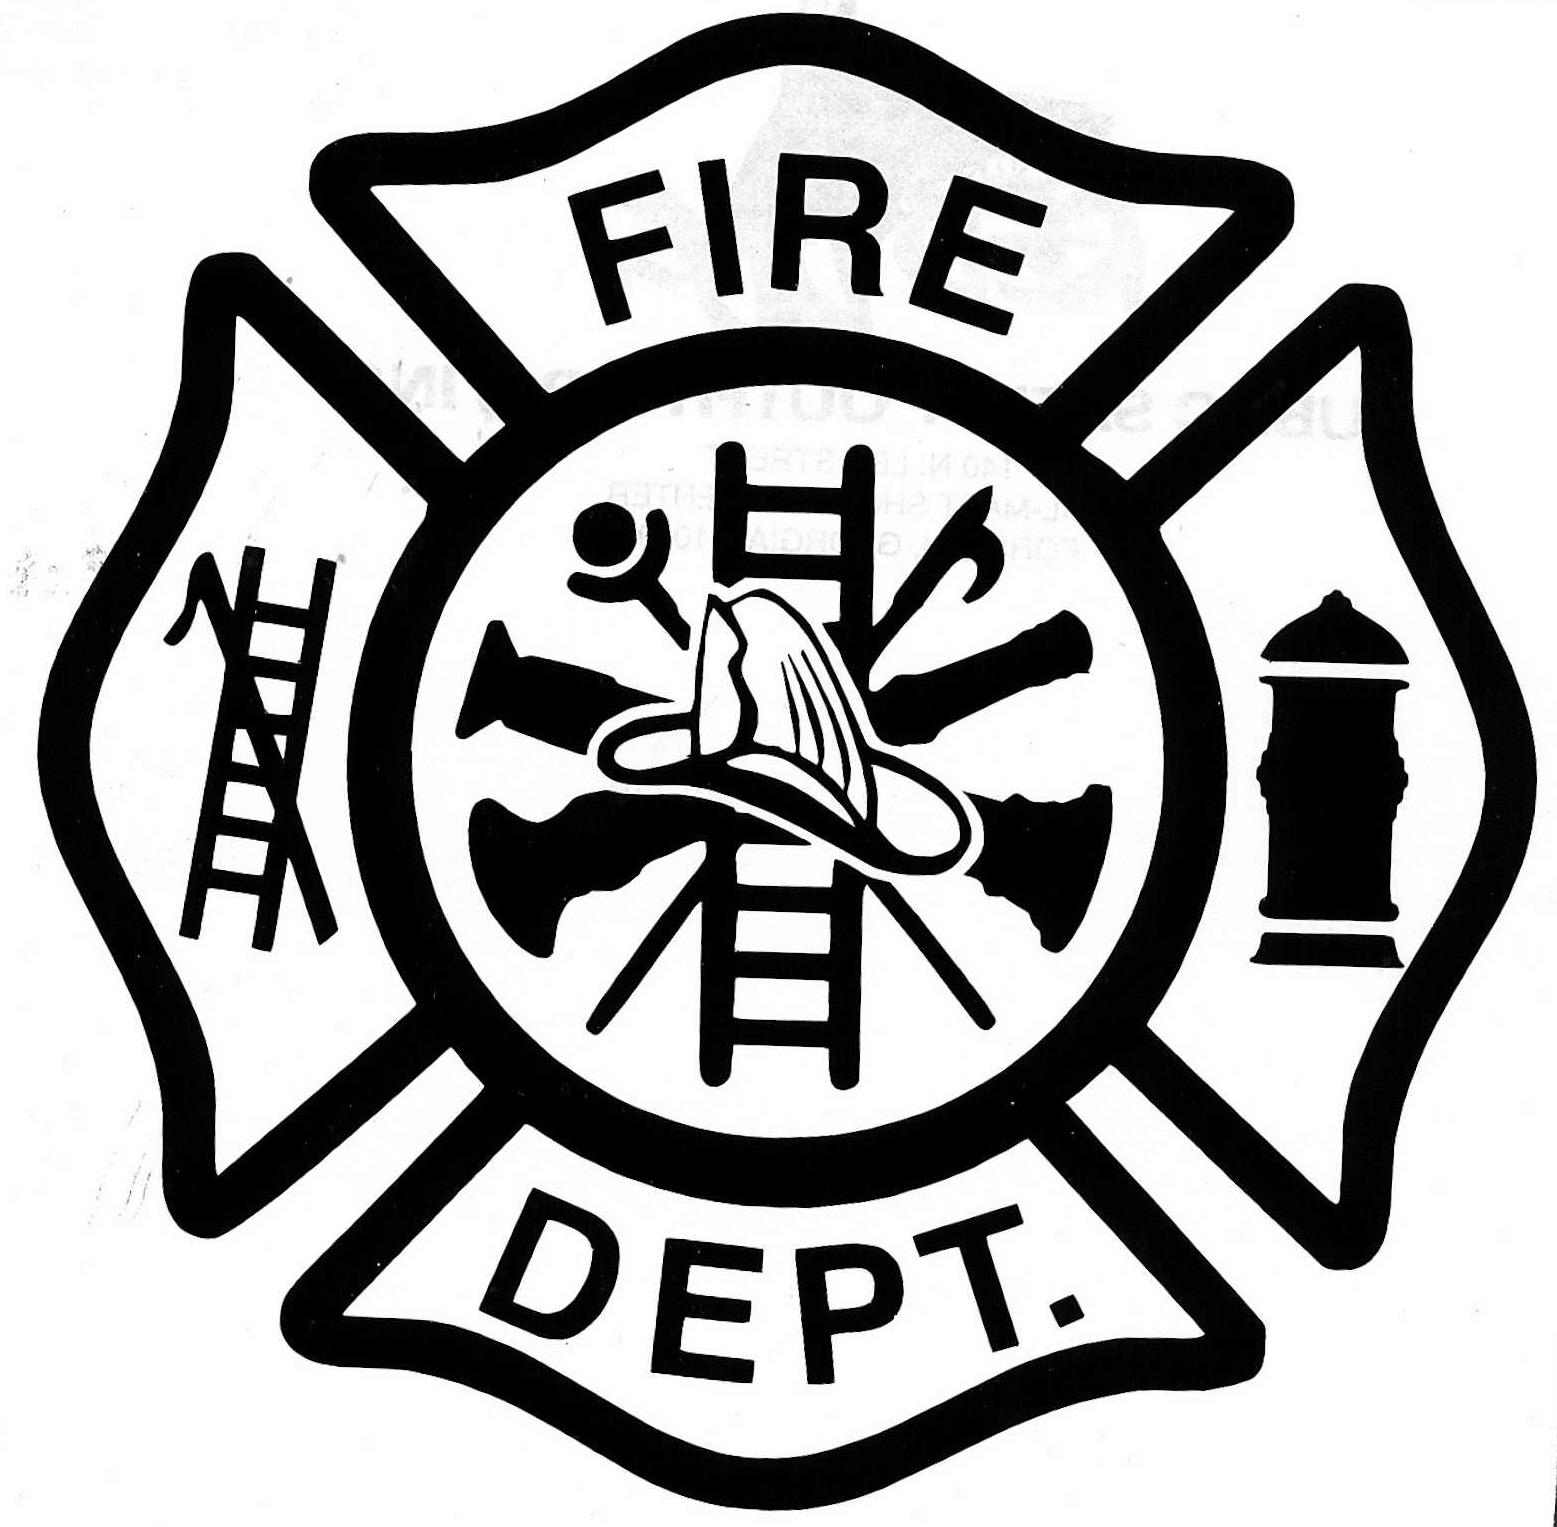 Firefighter clipart fire prevention Department Clinton Fire City